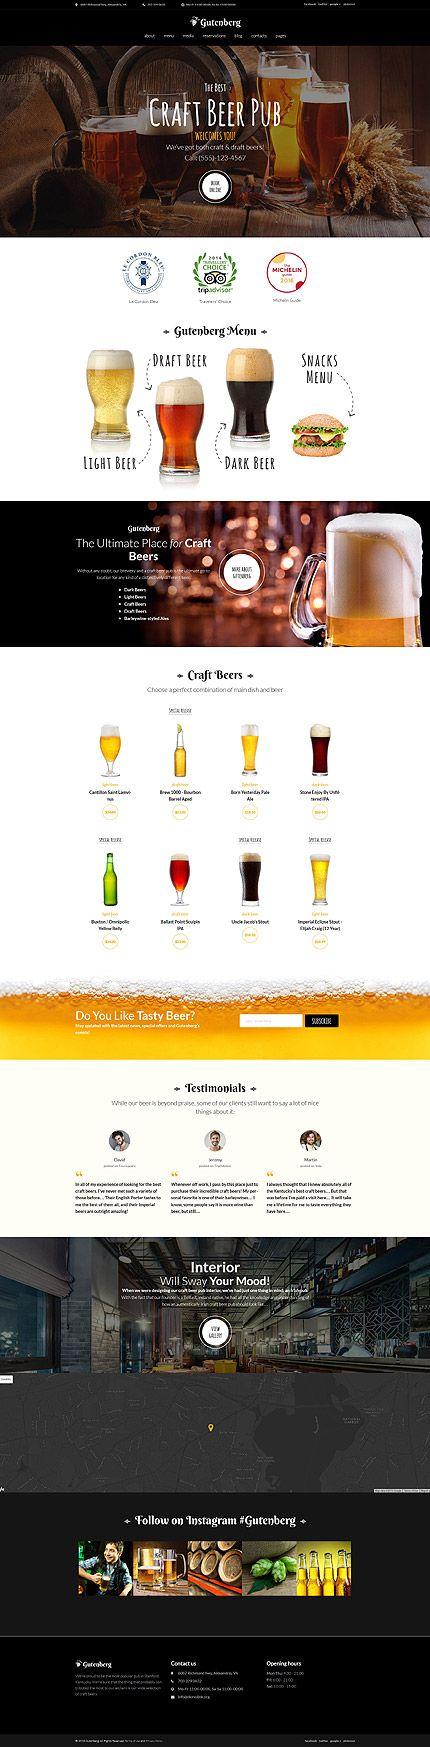 Craft Beer Pub Wordpress